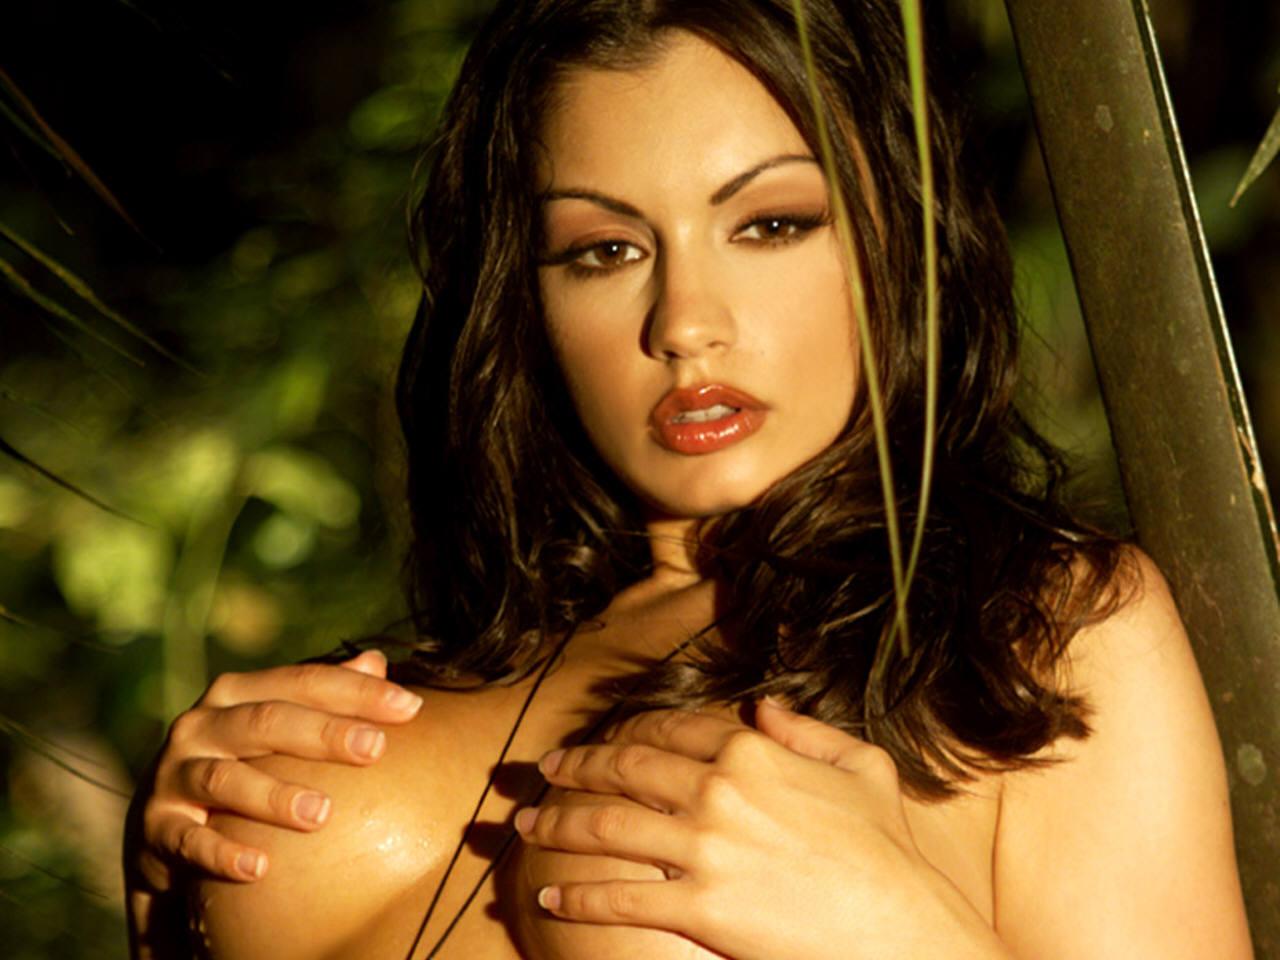 Фото ариа джовани, Aria Giovanni - все порно и секс фото модели 19 фотография